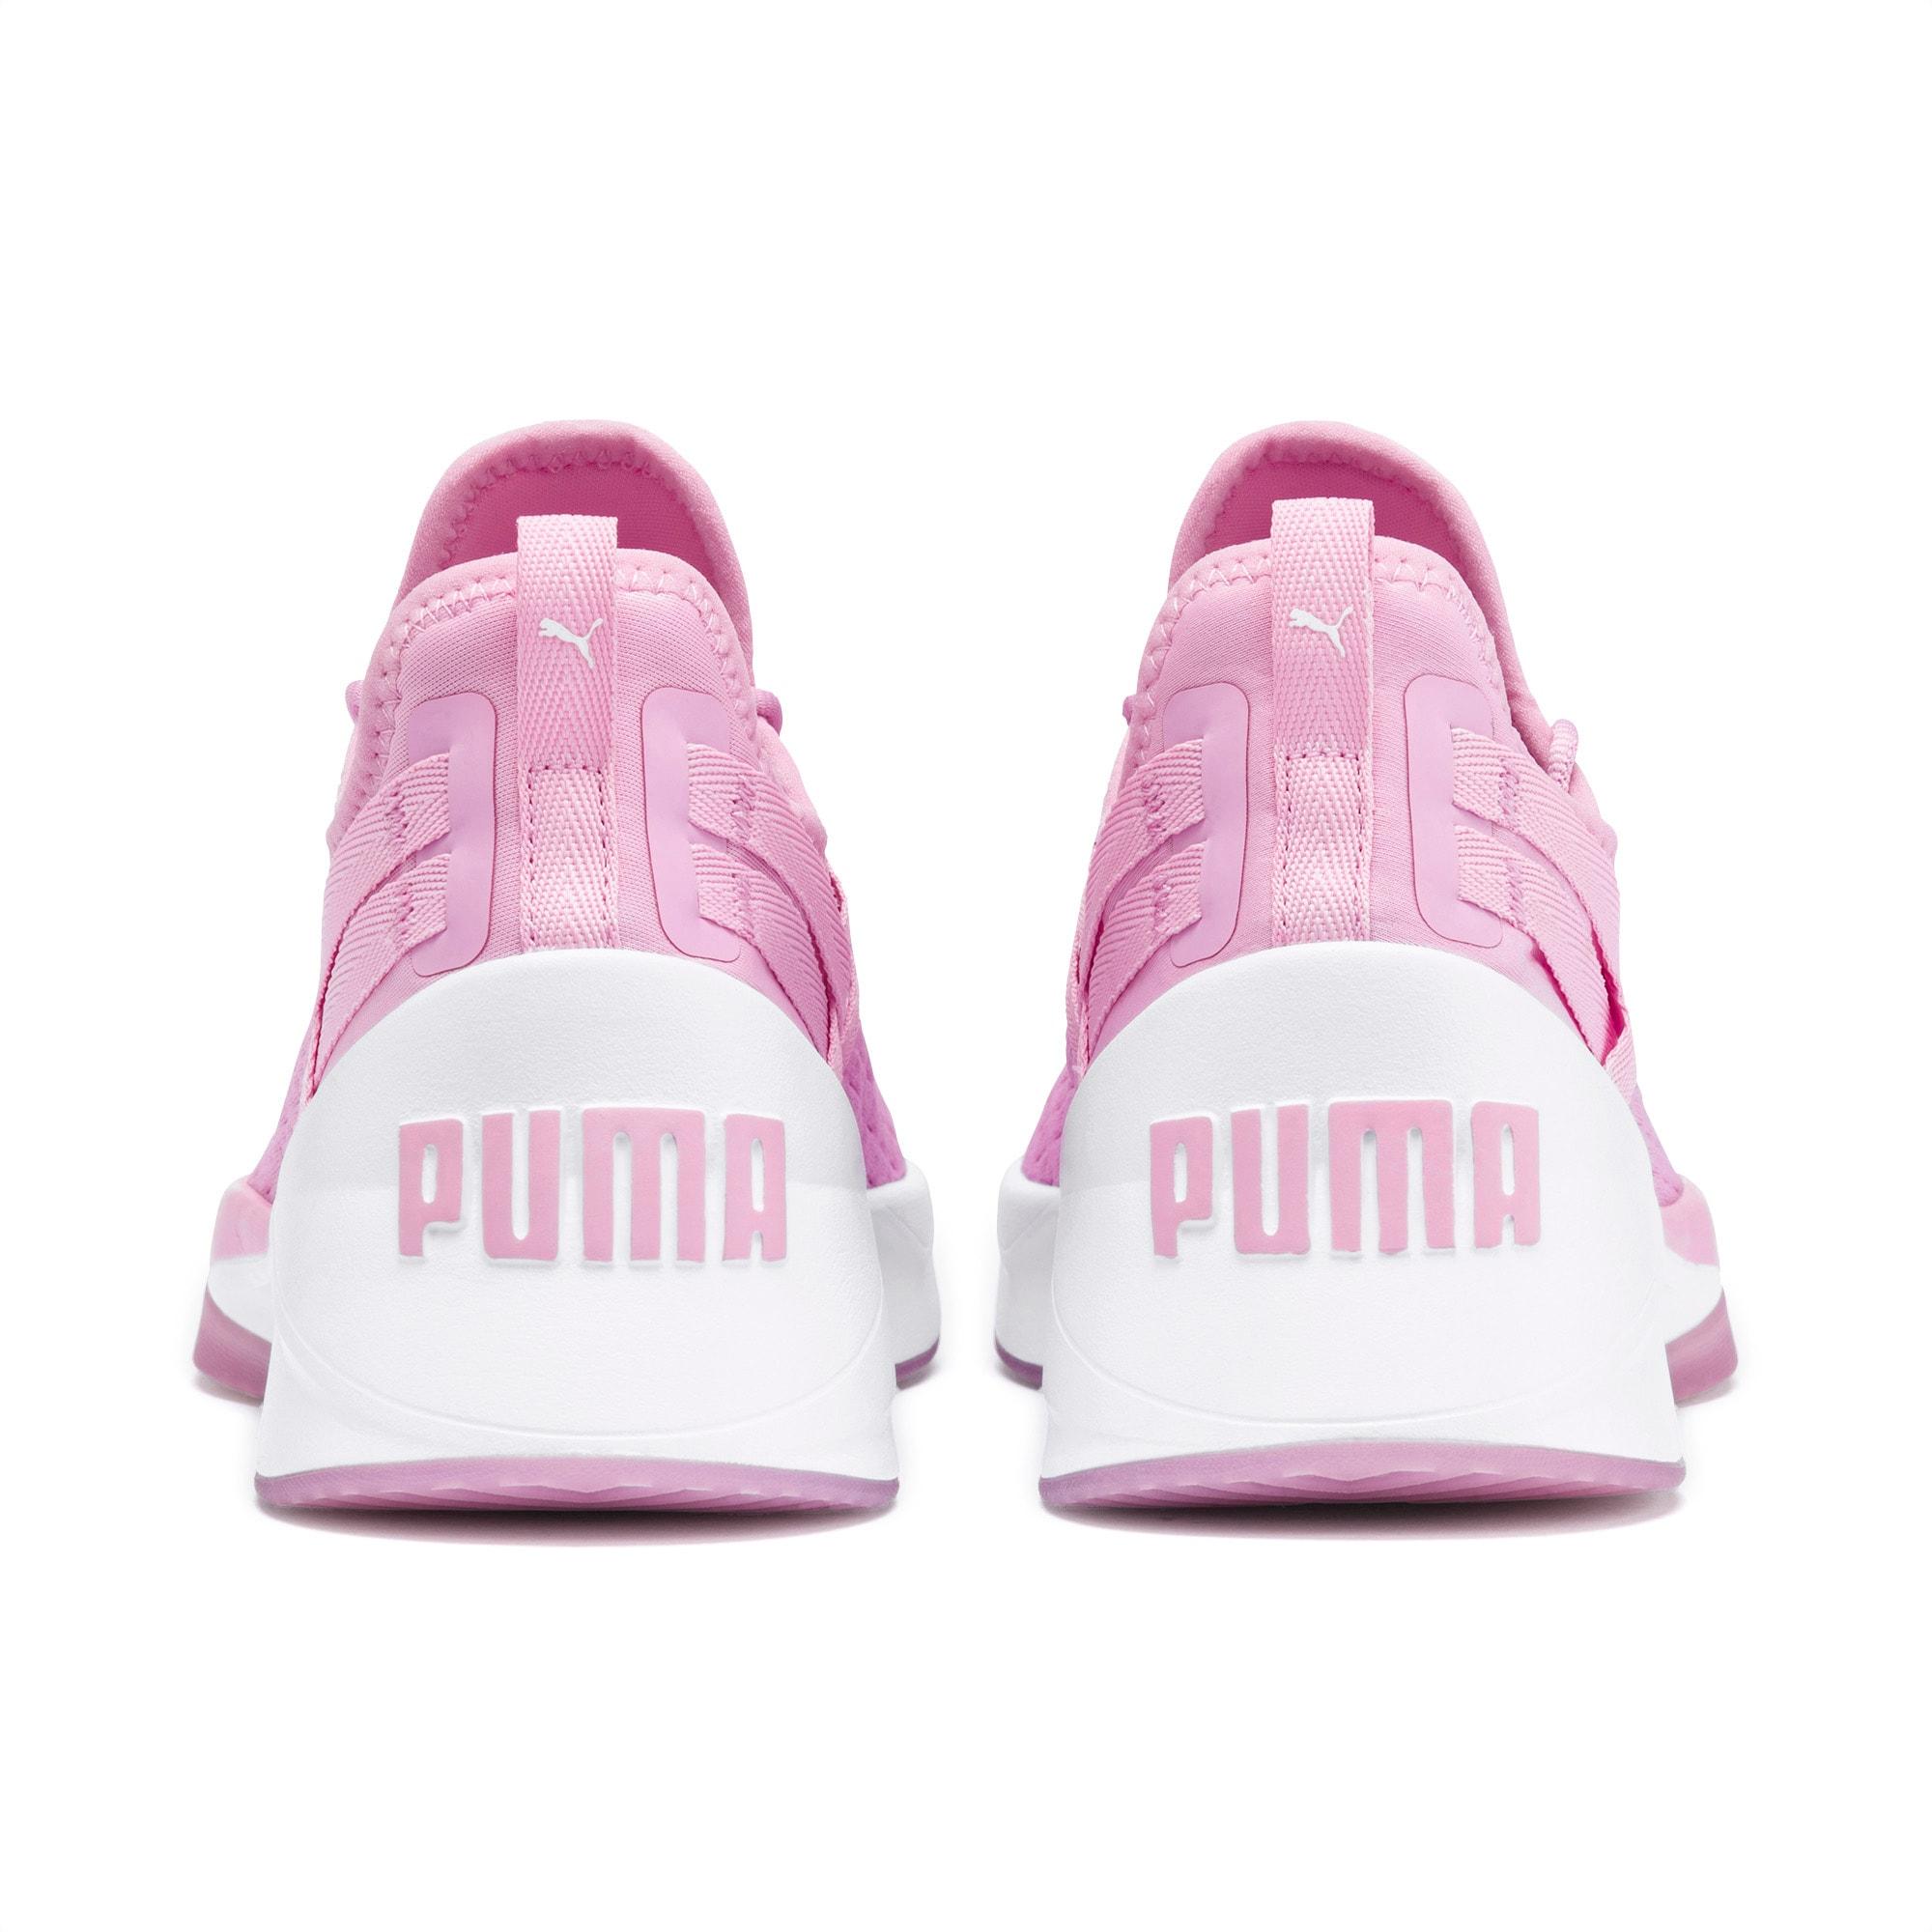 Damskie buty treningowe Jaab XT Trailblazer   PUMA Footwear